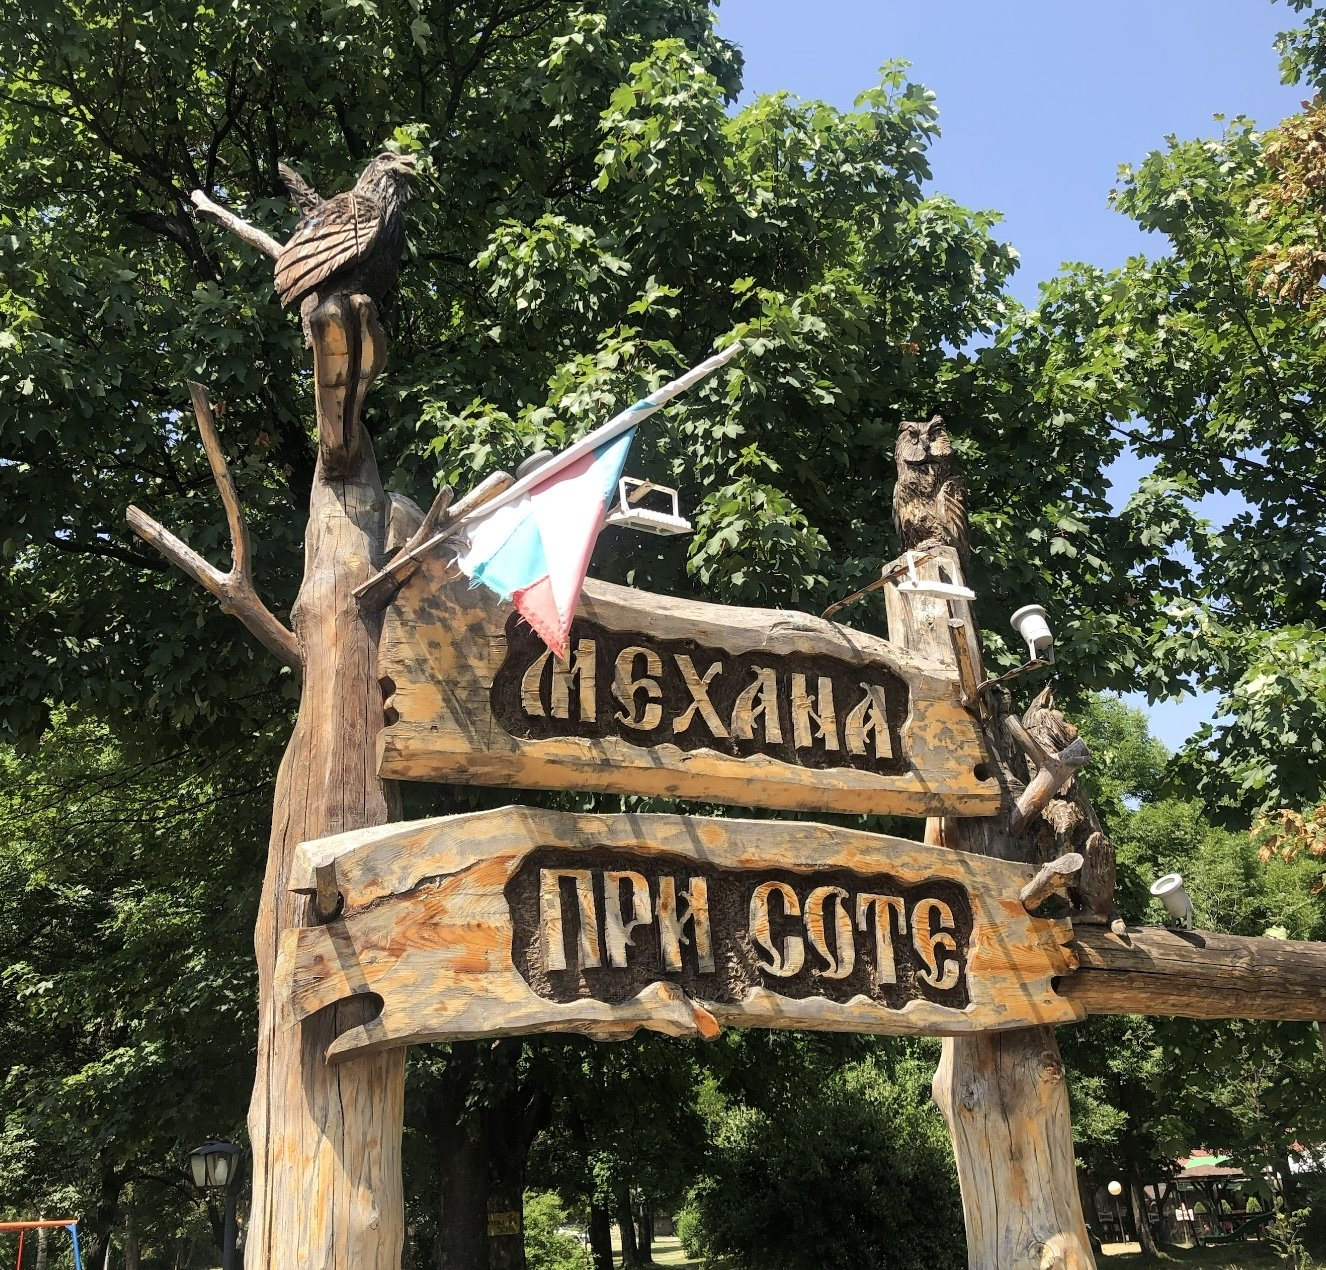 The sign of a 'mehana' where we stopped for lunch, Belitsa, Bulgaria.